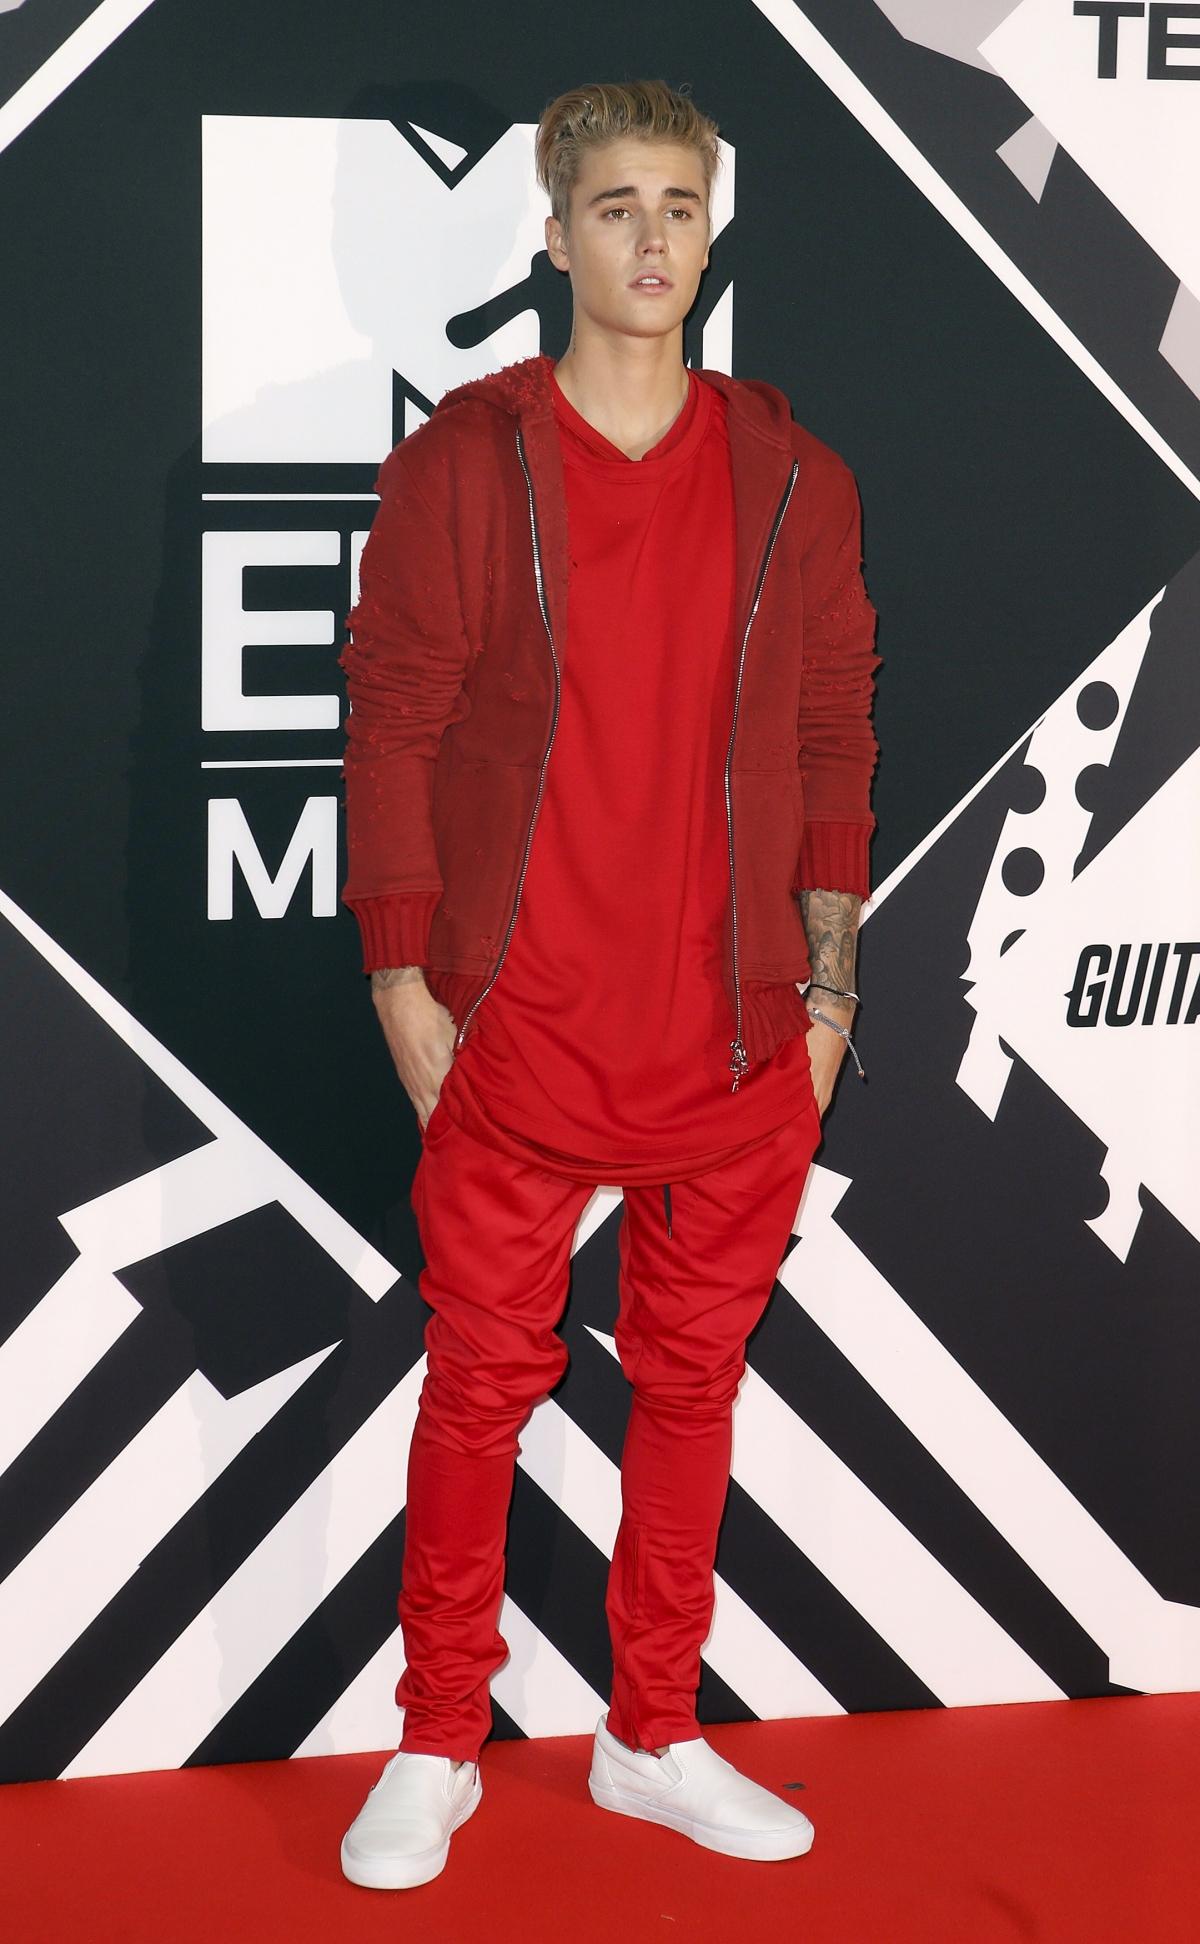 MTV EMA 2015 winners list: Justin Bieber, Ed Sheeran and ...